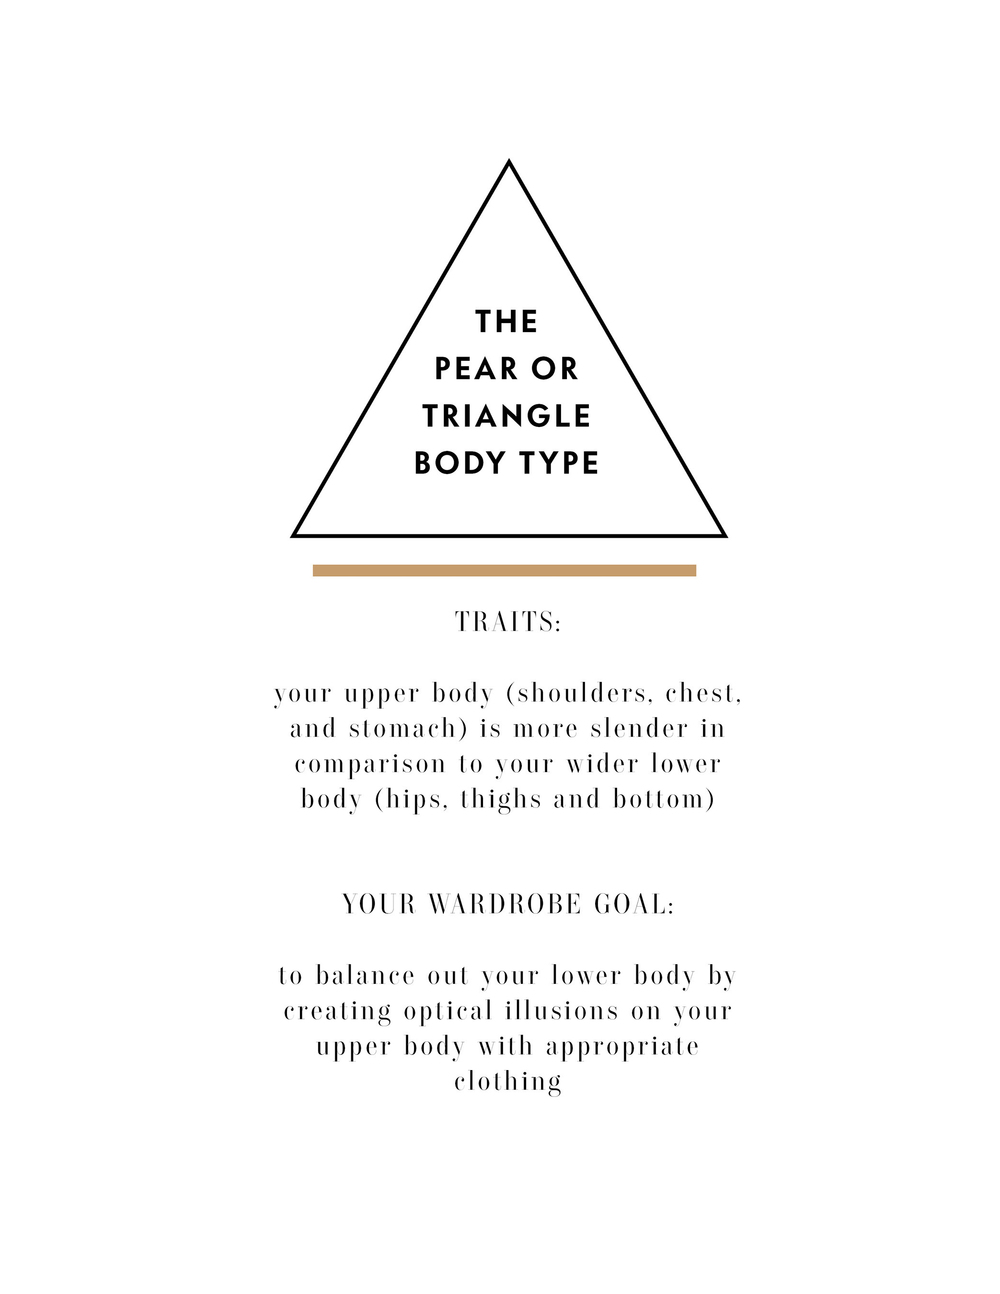 What to Wear Guide - Digital PDF-7-Left.jpg